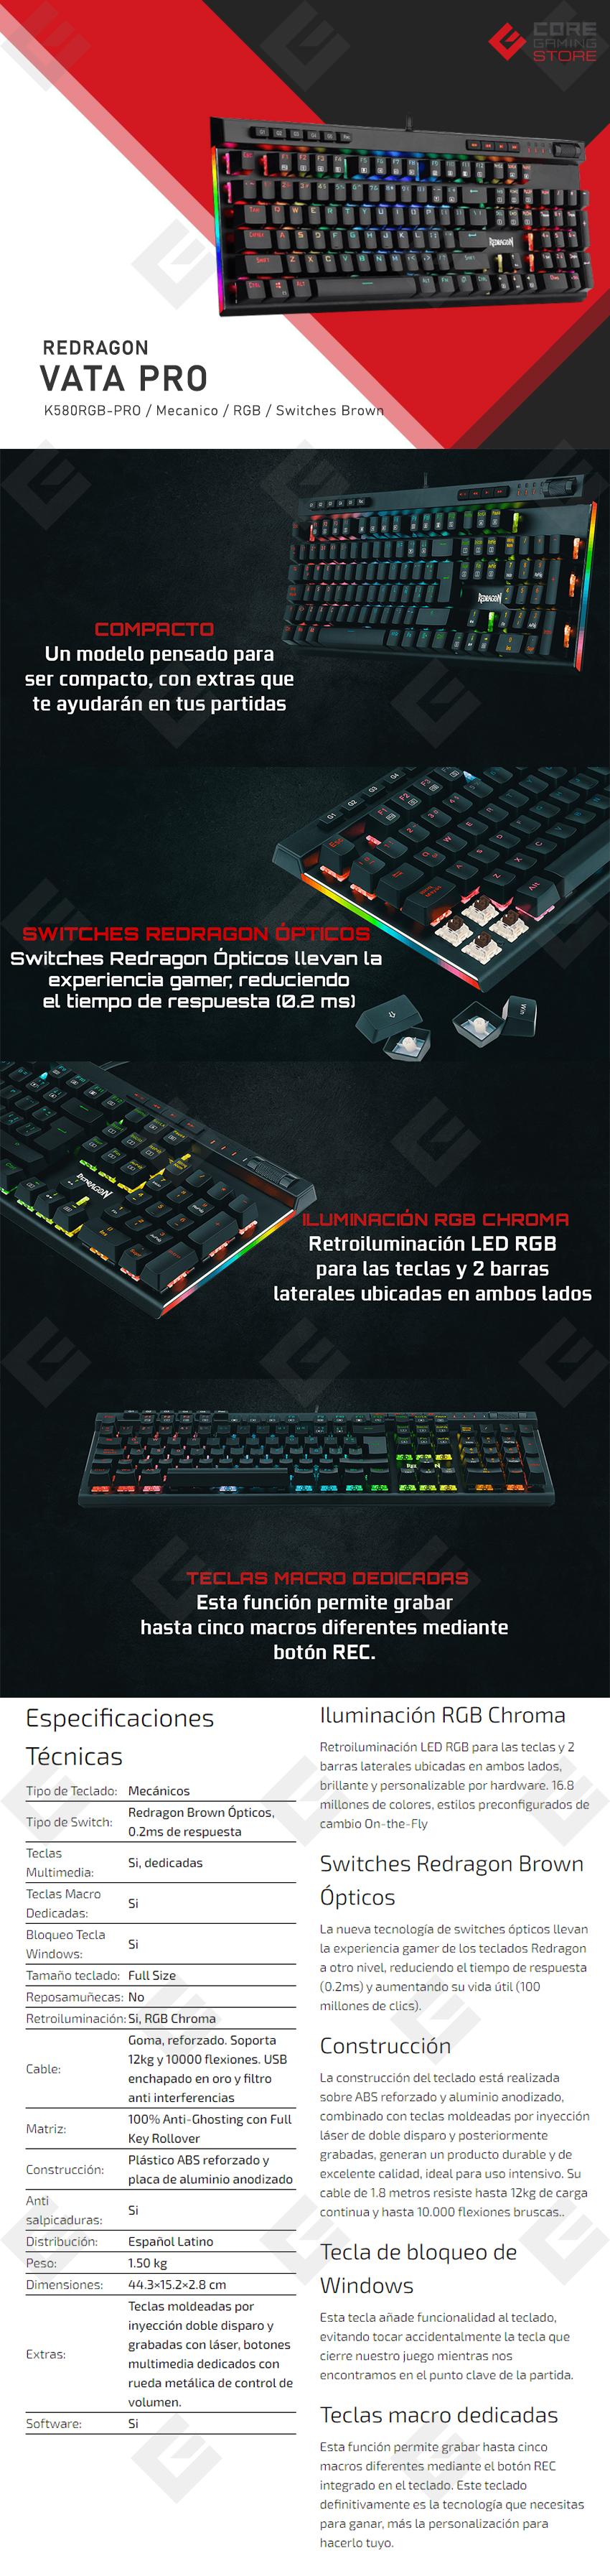 Teclado Mecanico Redragon Vata Pro K580RGB, Switches Redragon Brown, Español